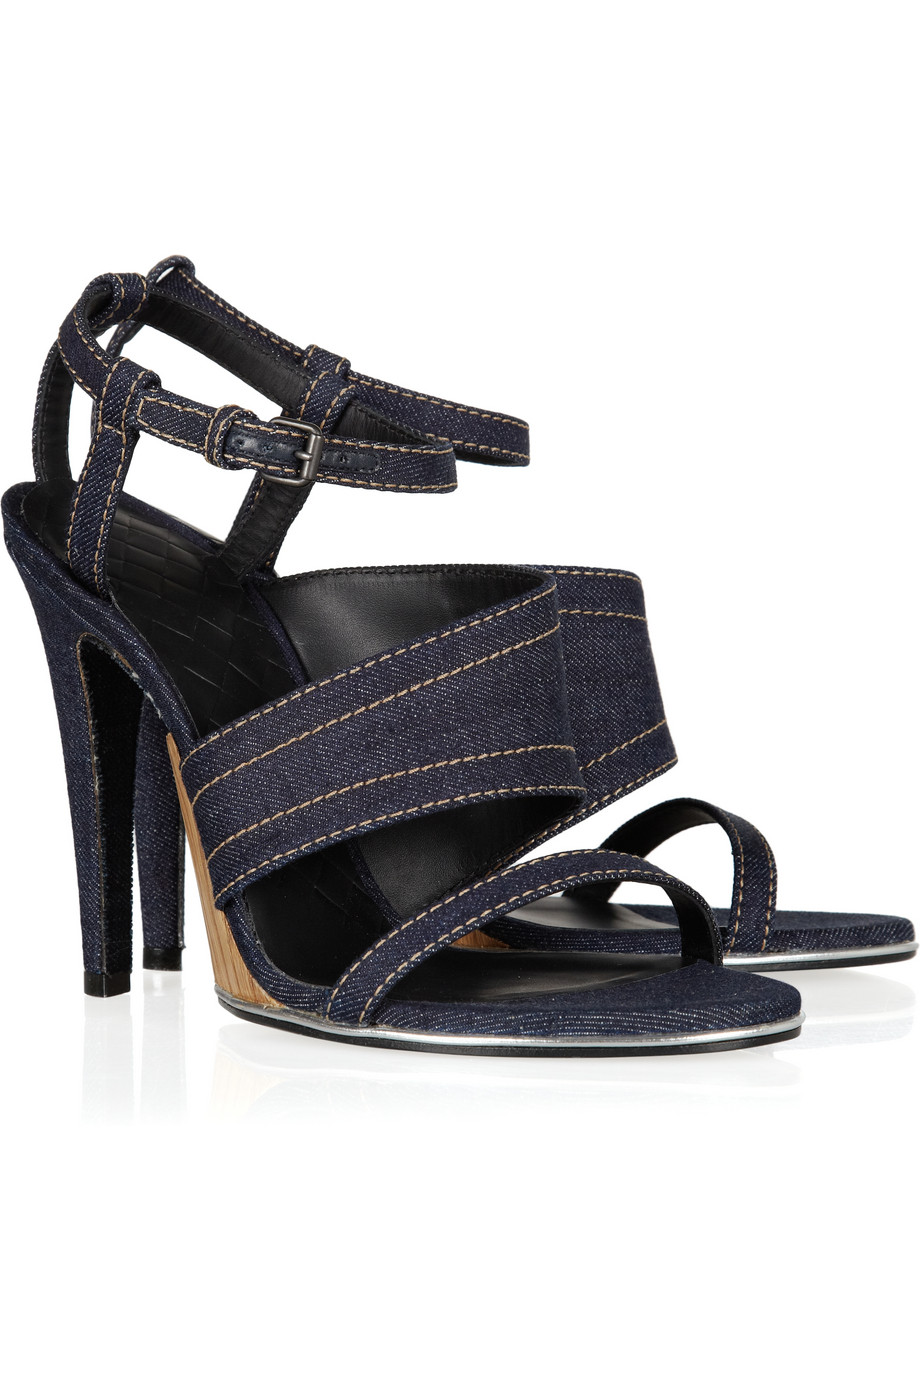 Bottega Veneta Leather Square-toe Thong Sandals in Black